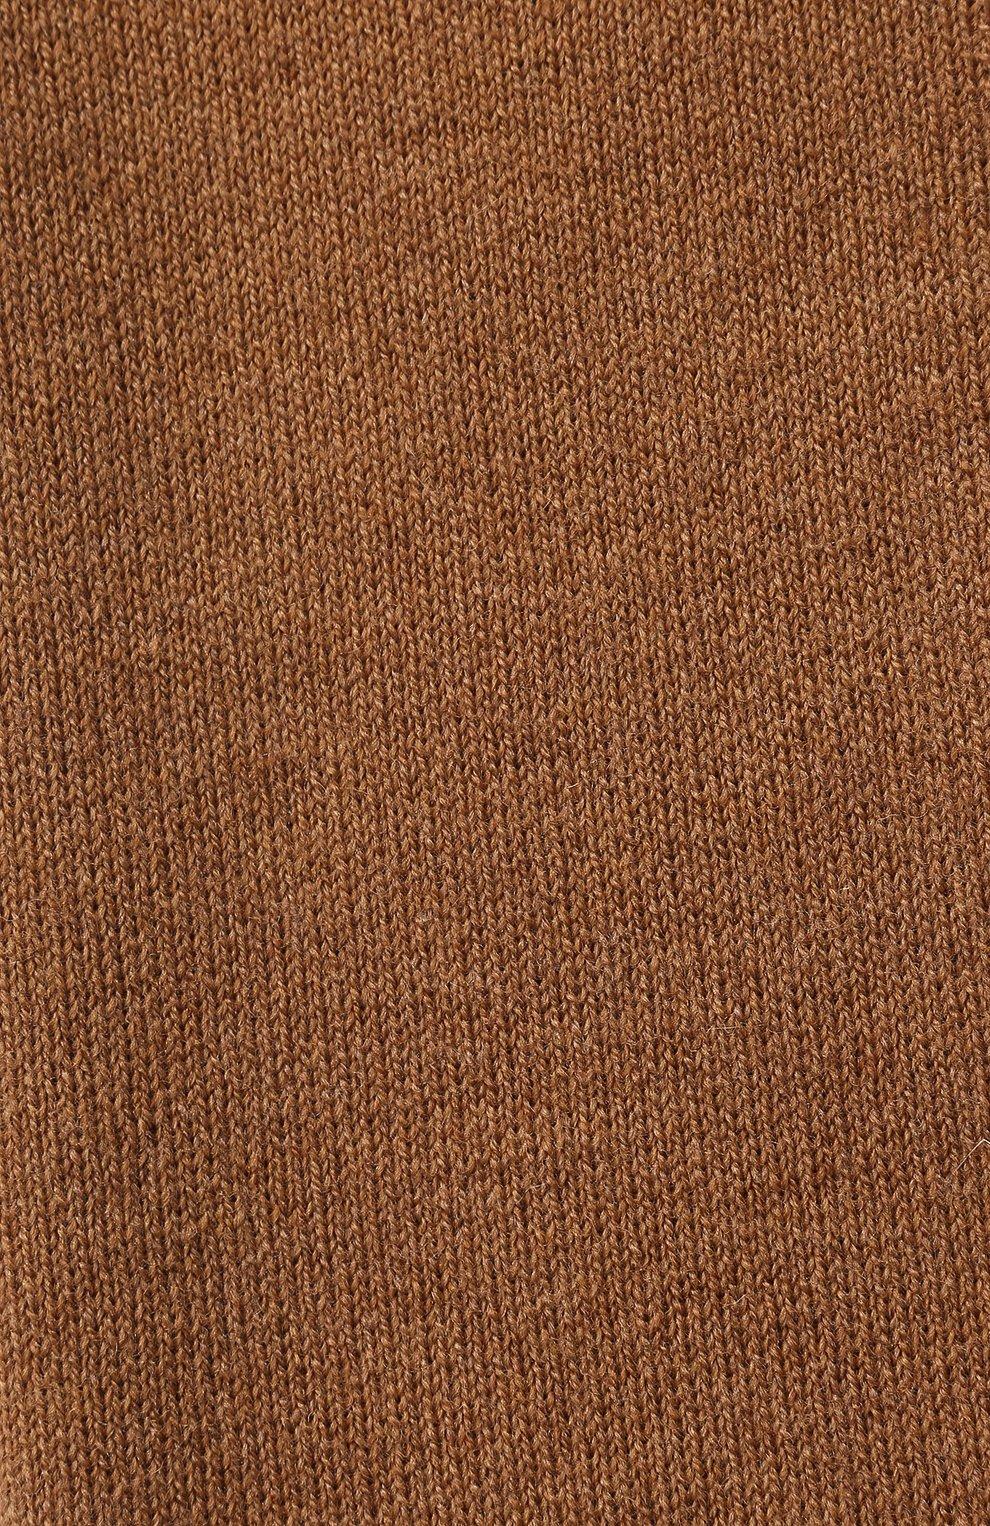 Мужской шерстяной шарф civil CANOE бежевого цвета, арт. 4805850 | Фото 2